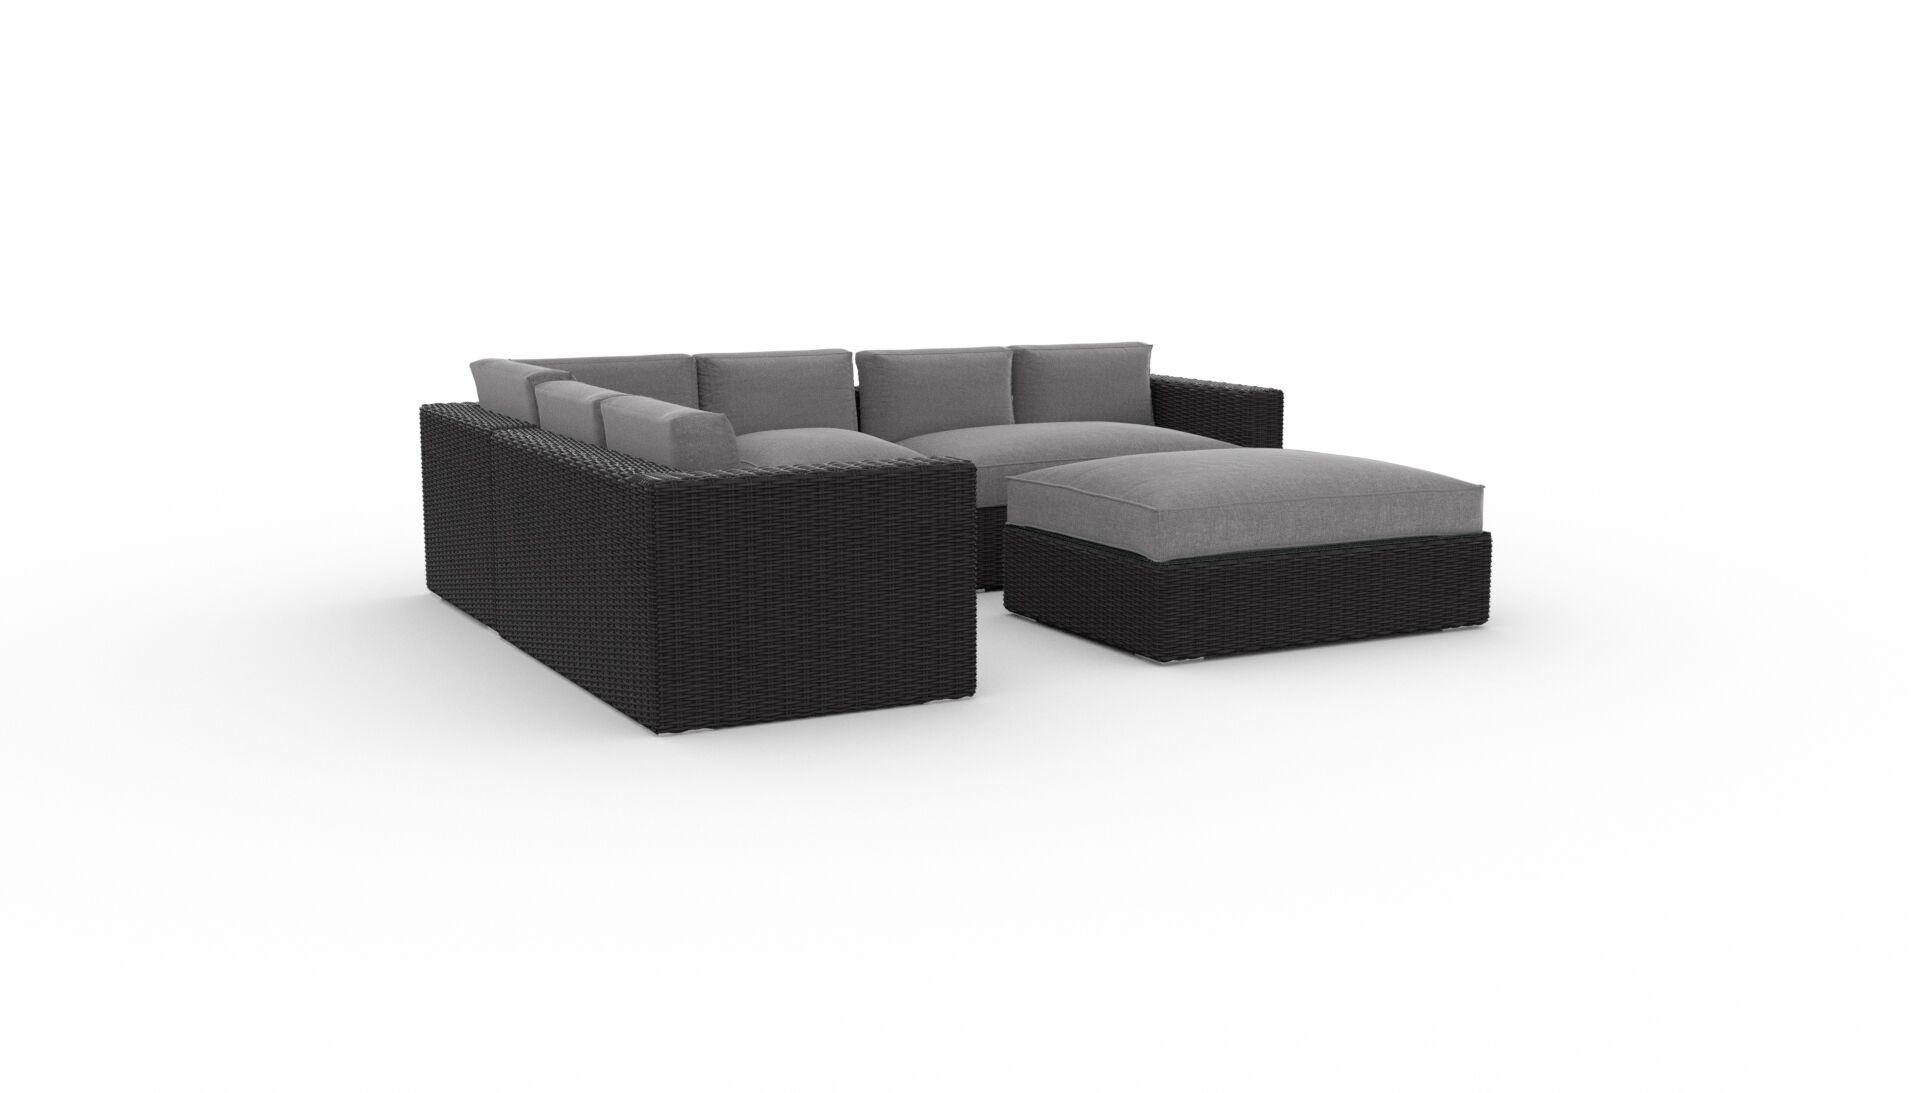 Boothe 5 Piece Rattan Sunbrella Sectional Set with Cushions Cushion Color: Cast Slate